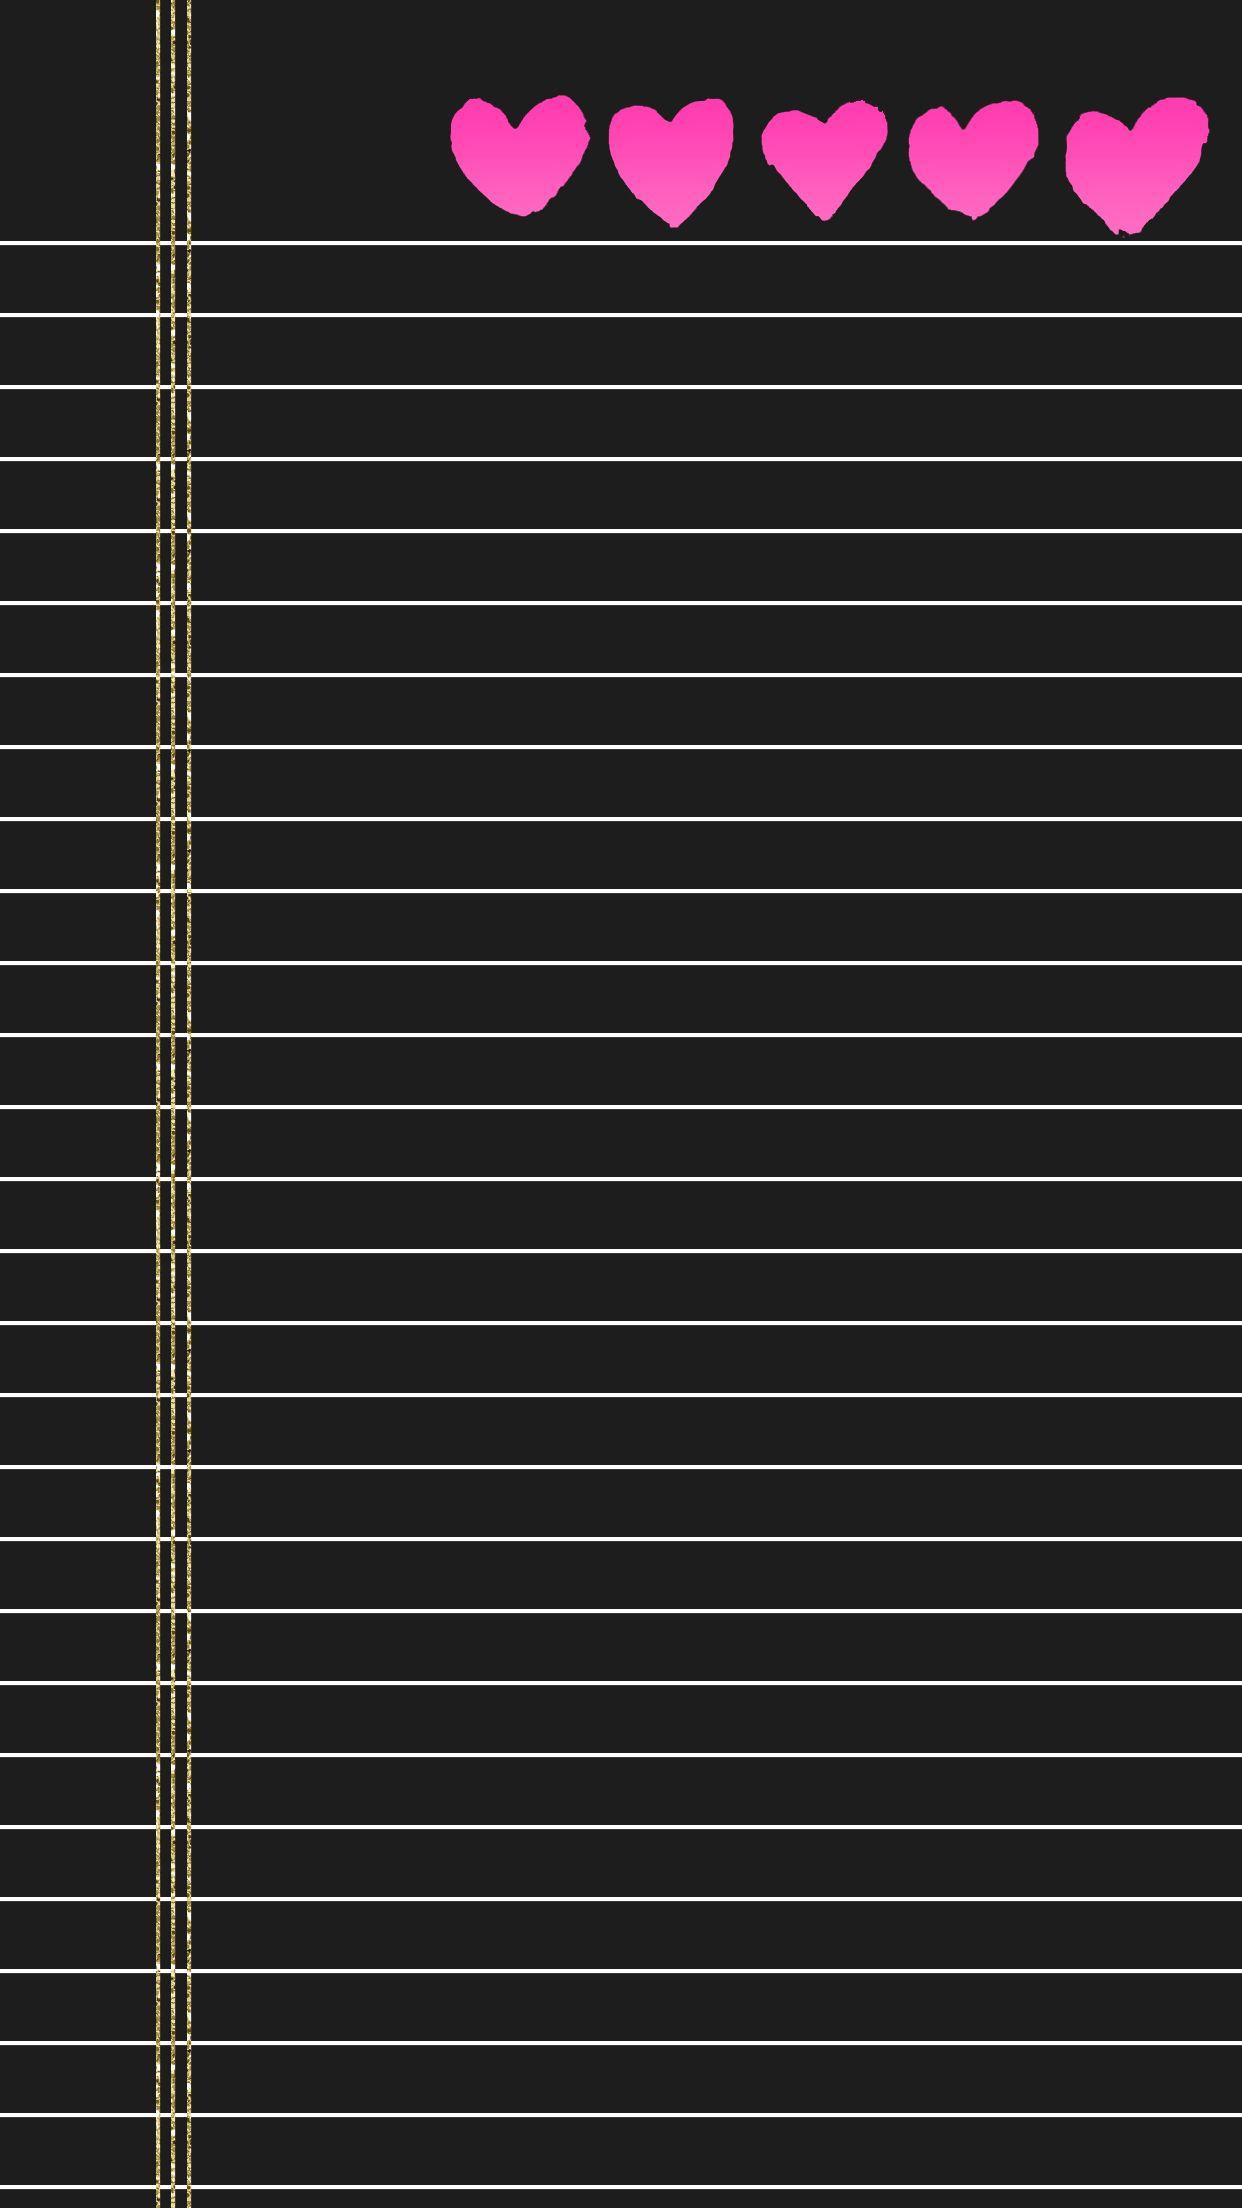 Dark Souls Wallpaper 4k Phone 540x960 Download Hd Wallpaper Wallpapertip